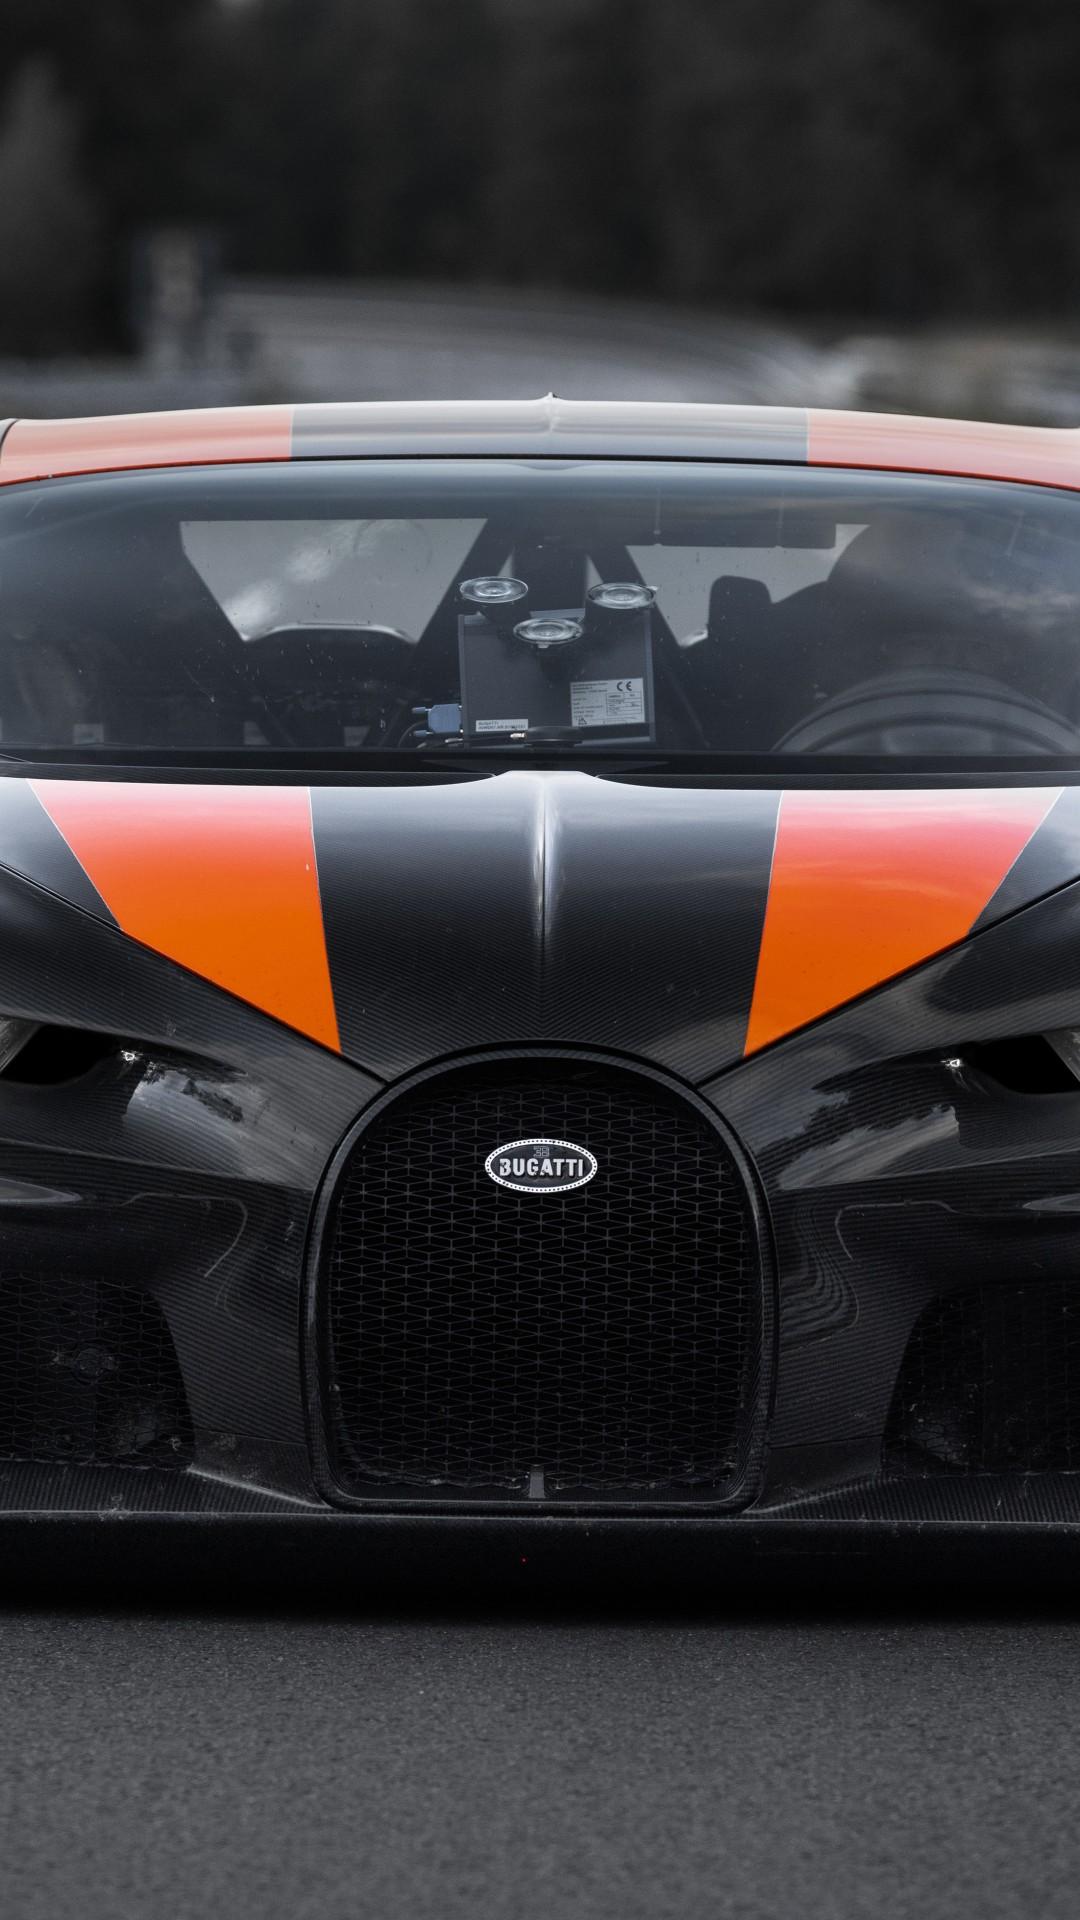 Bugatti Chiron Prototype Wallpaper